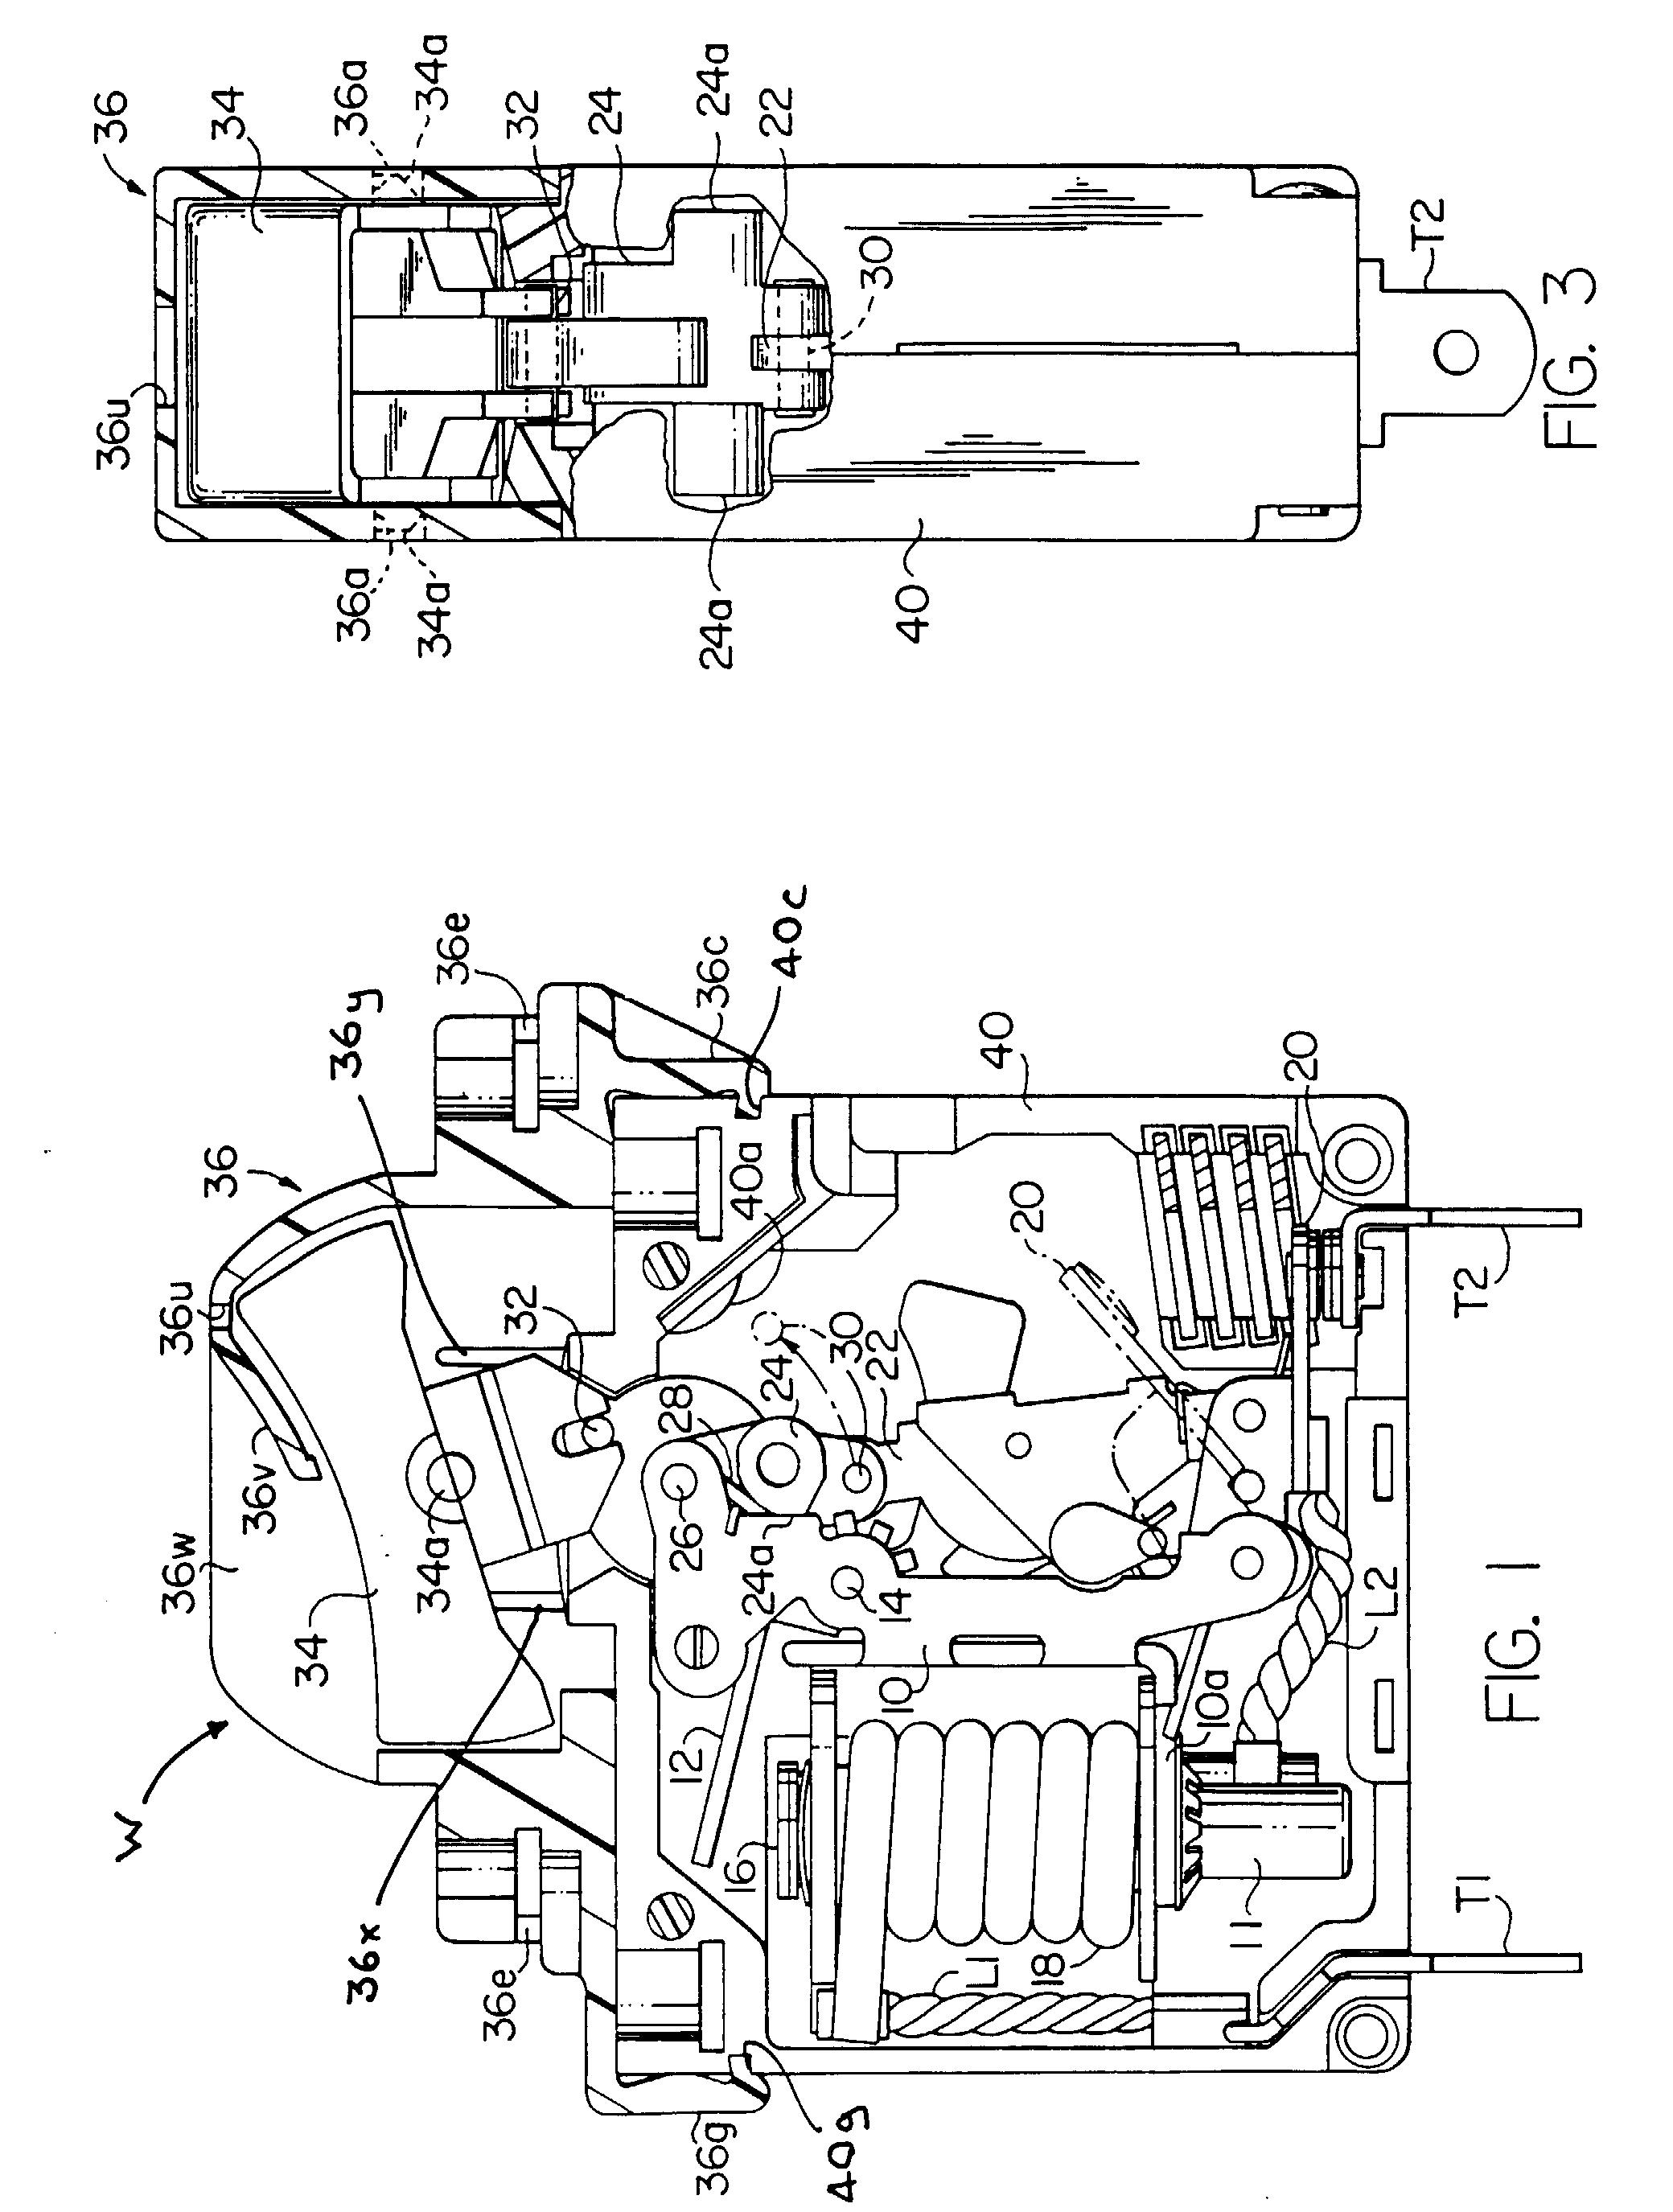 patent ep0694947b1